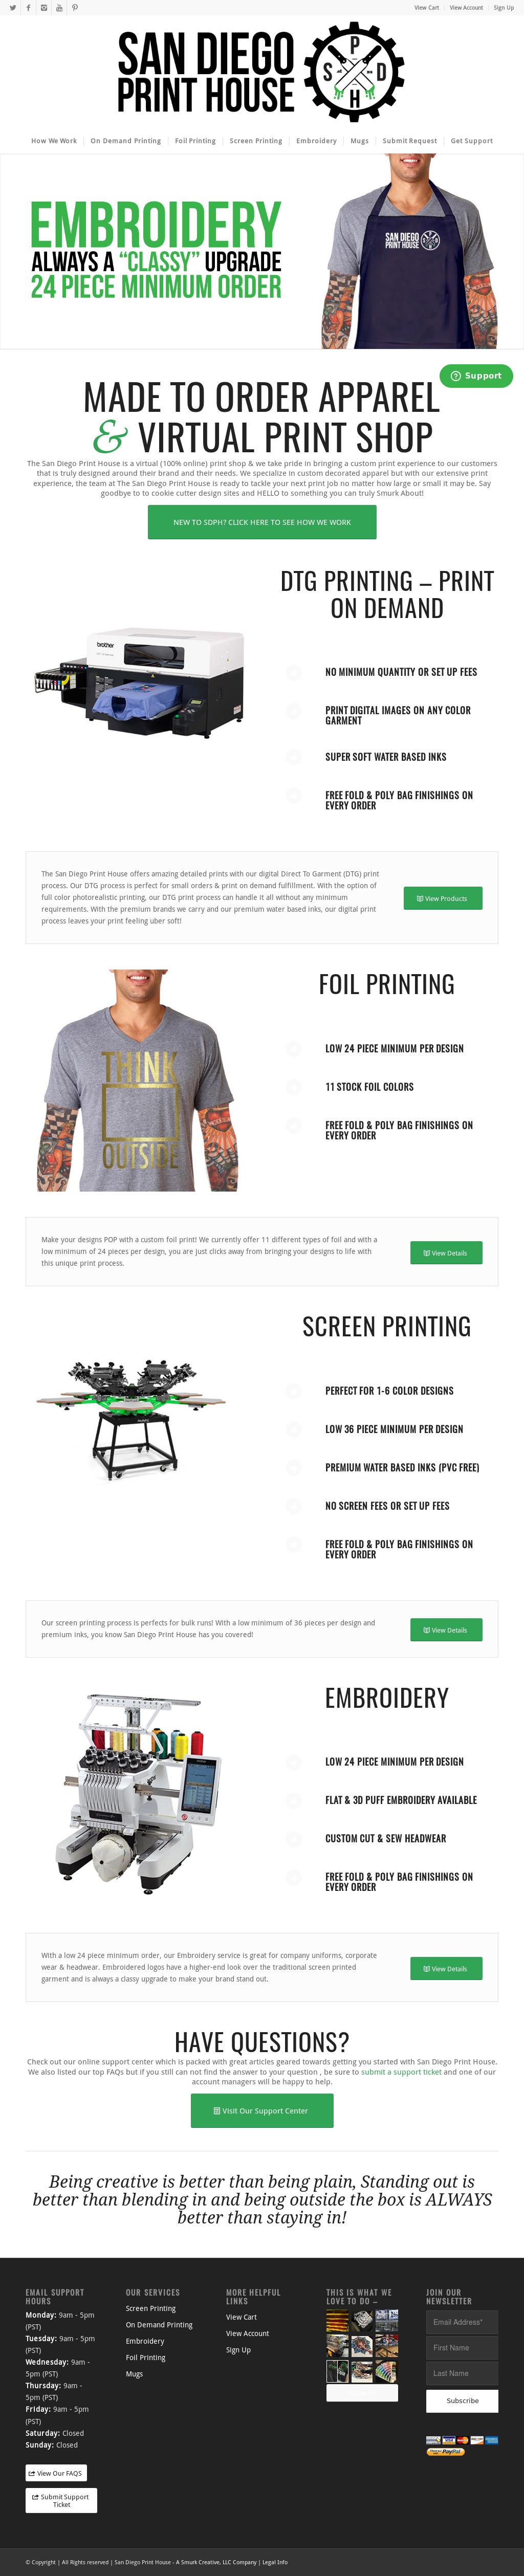 Custom Printed T Shirts San Diego Summer Cook